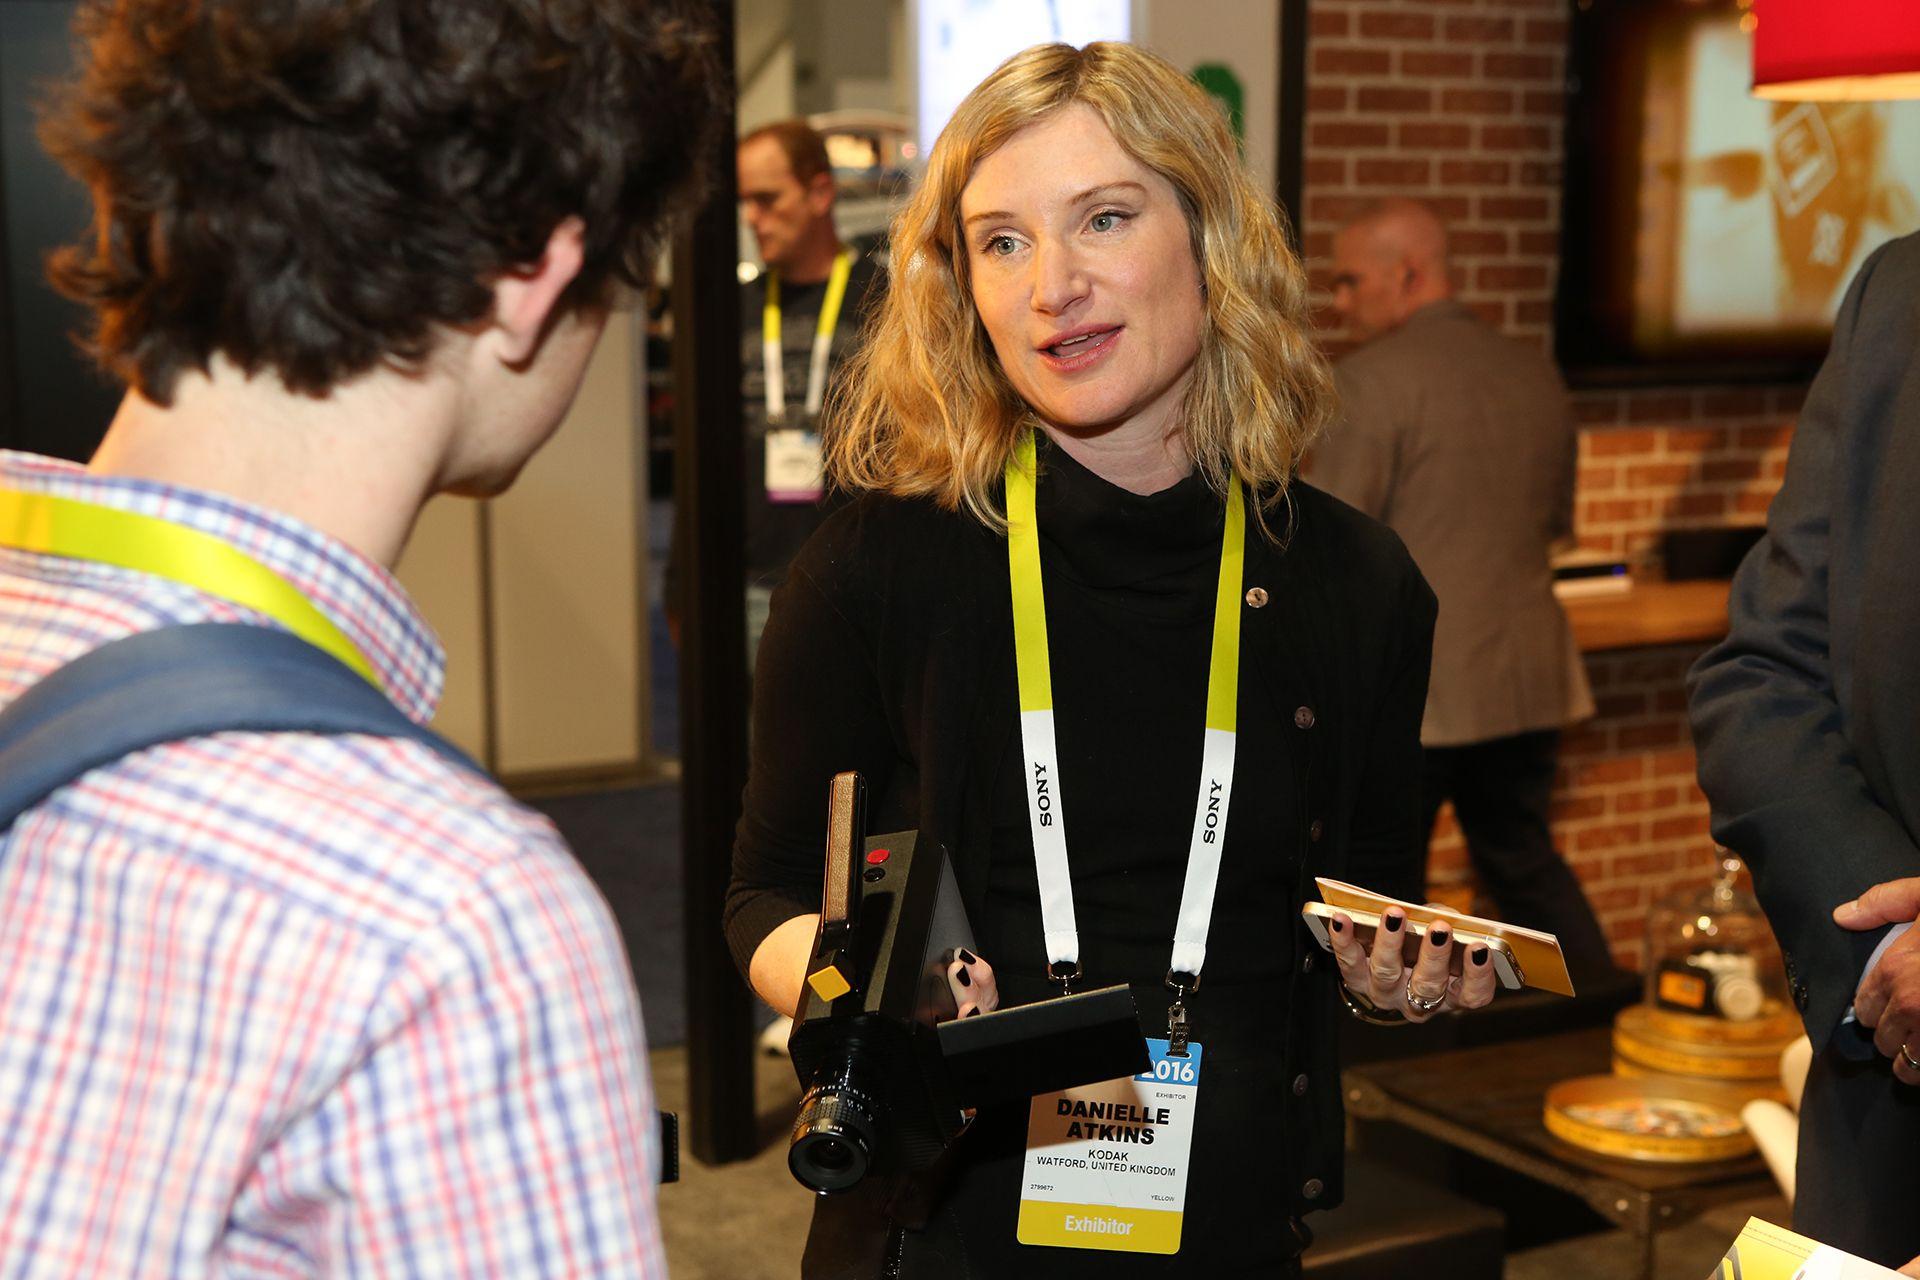 Danielle Atkins, directora global de la identidad de marca, Kodak